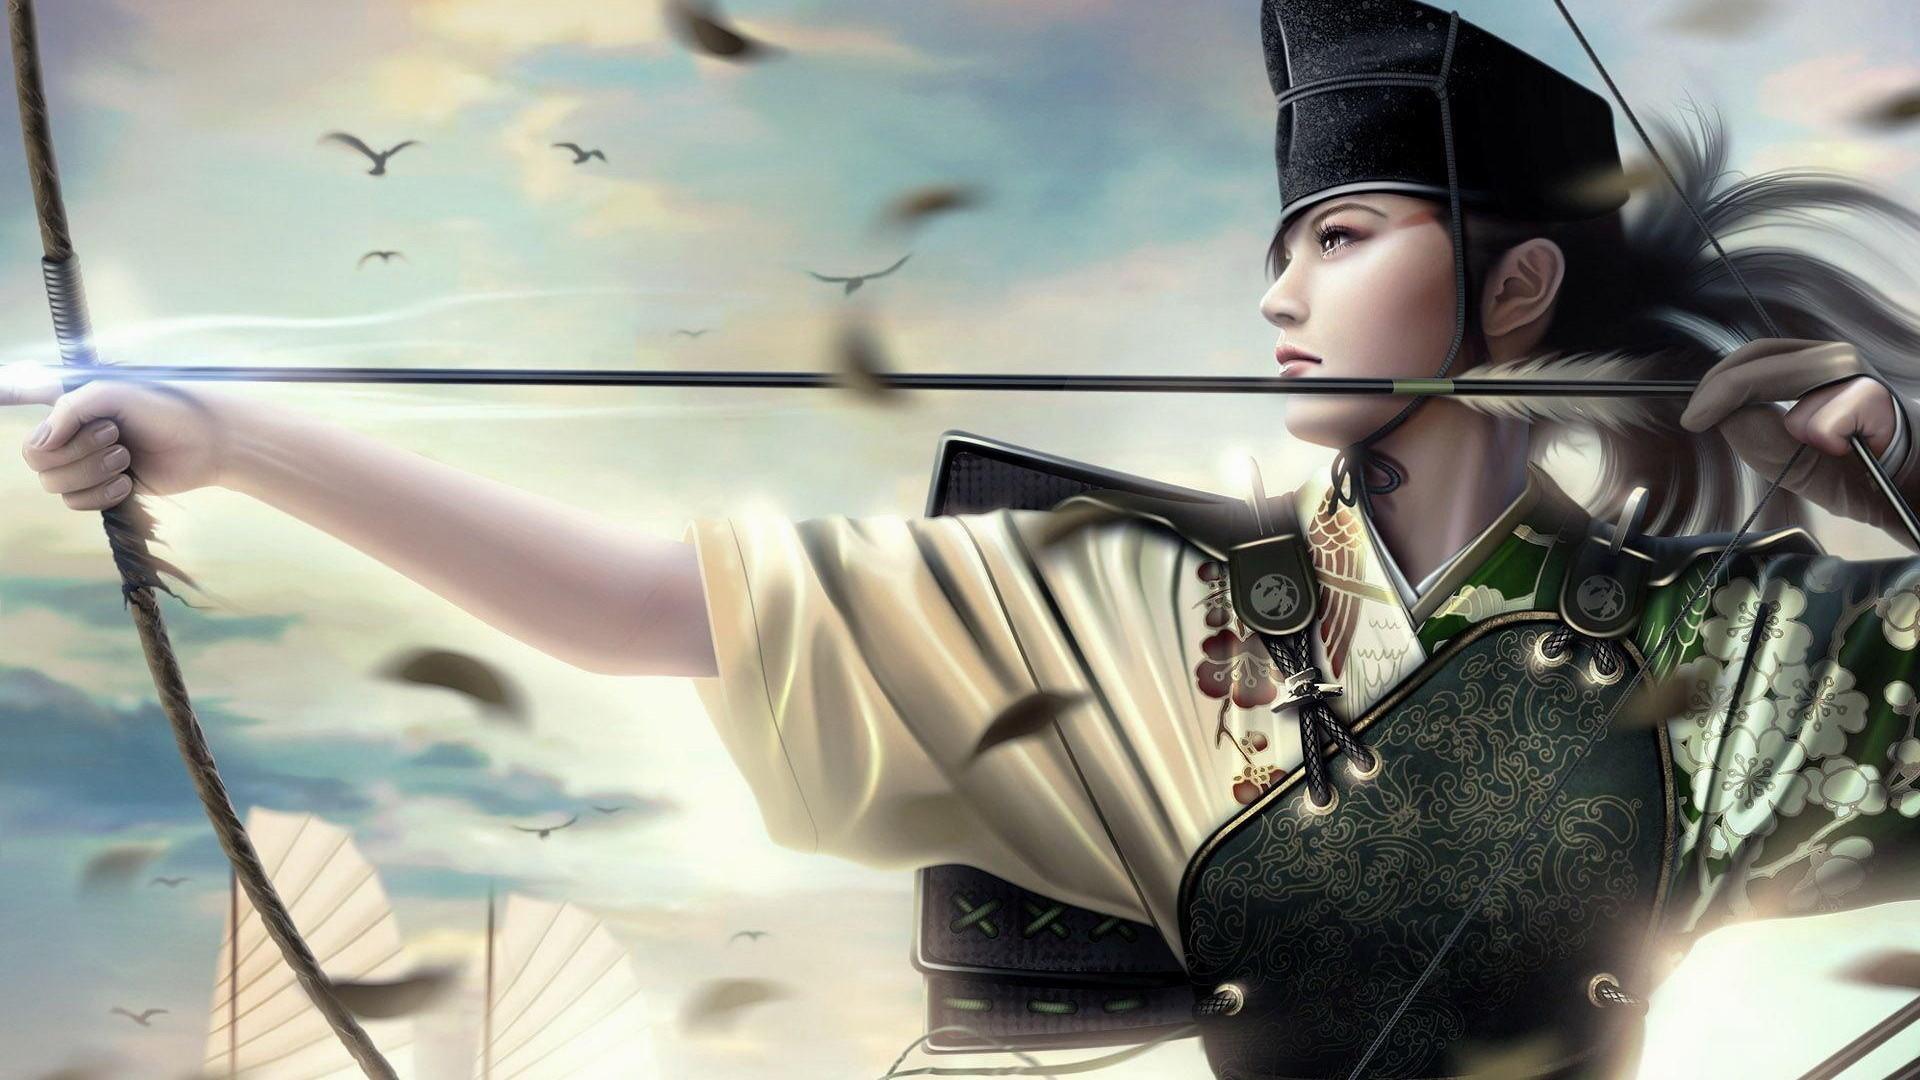 wallpaper.wiki-Cool-Badass-Anime-Wallpaper-PIC-WPC0010220